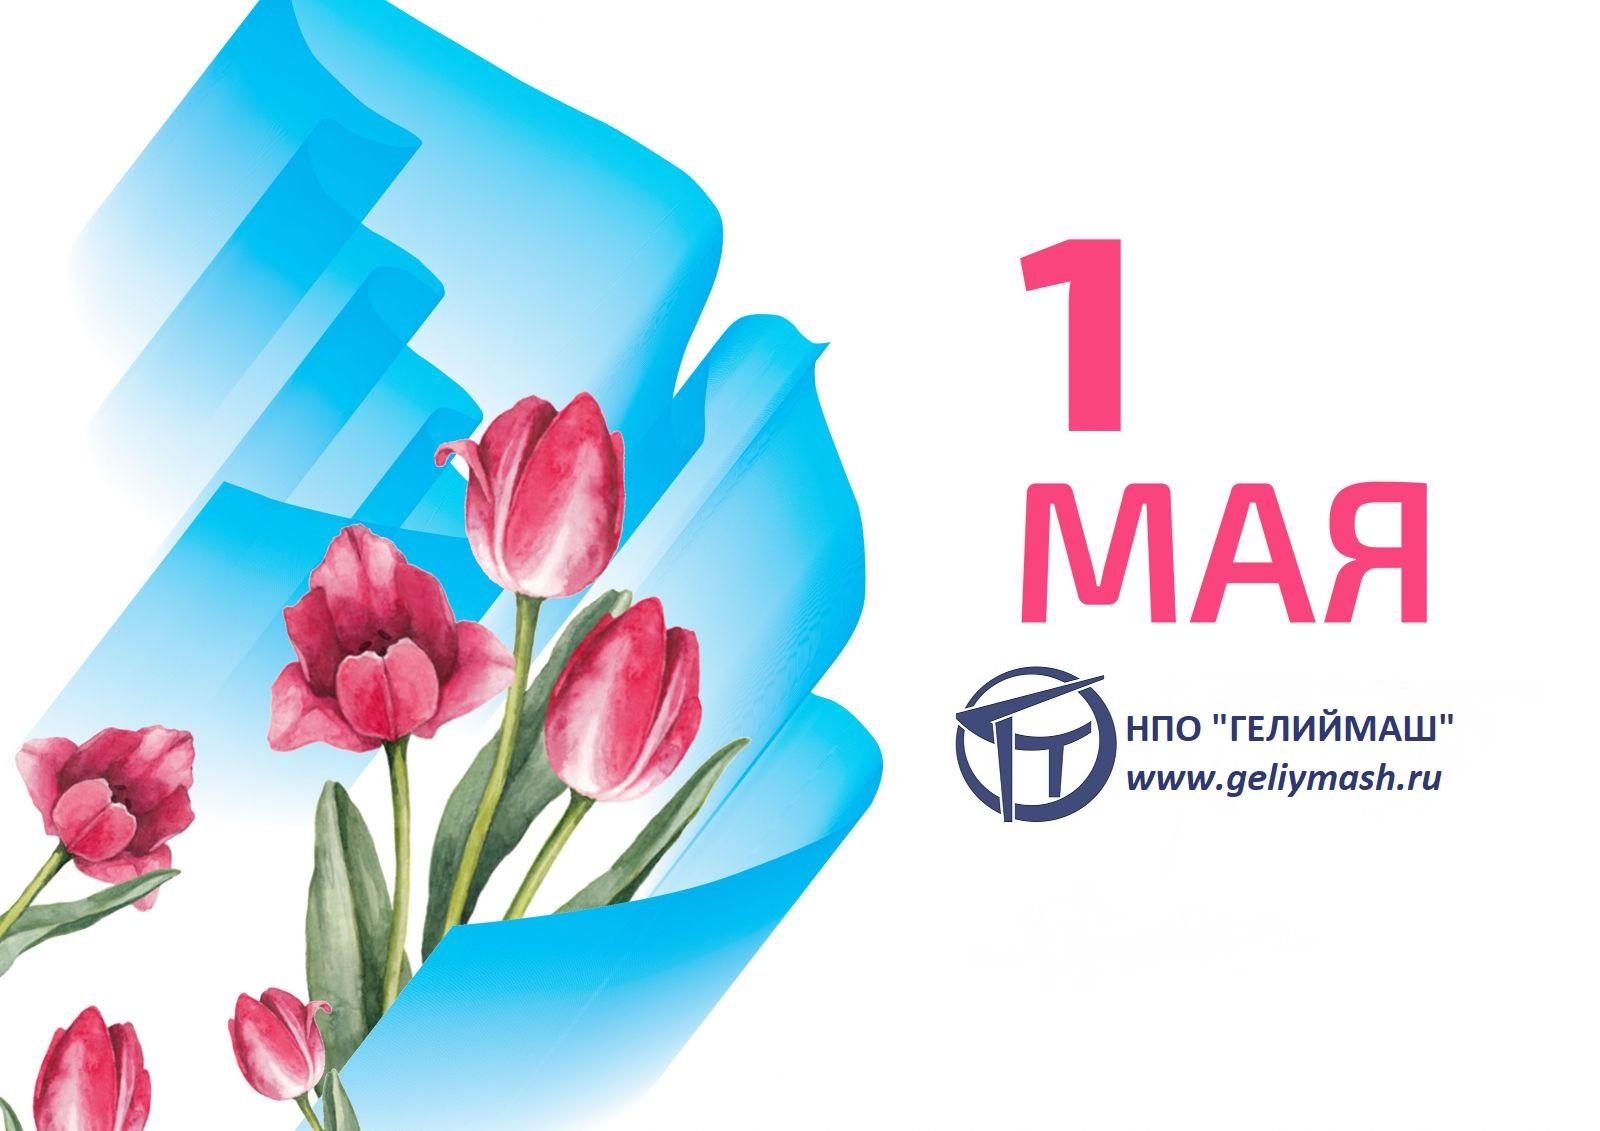 1 мая 2019 гелиймаш